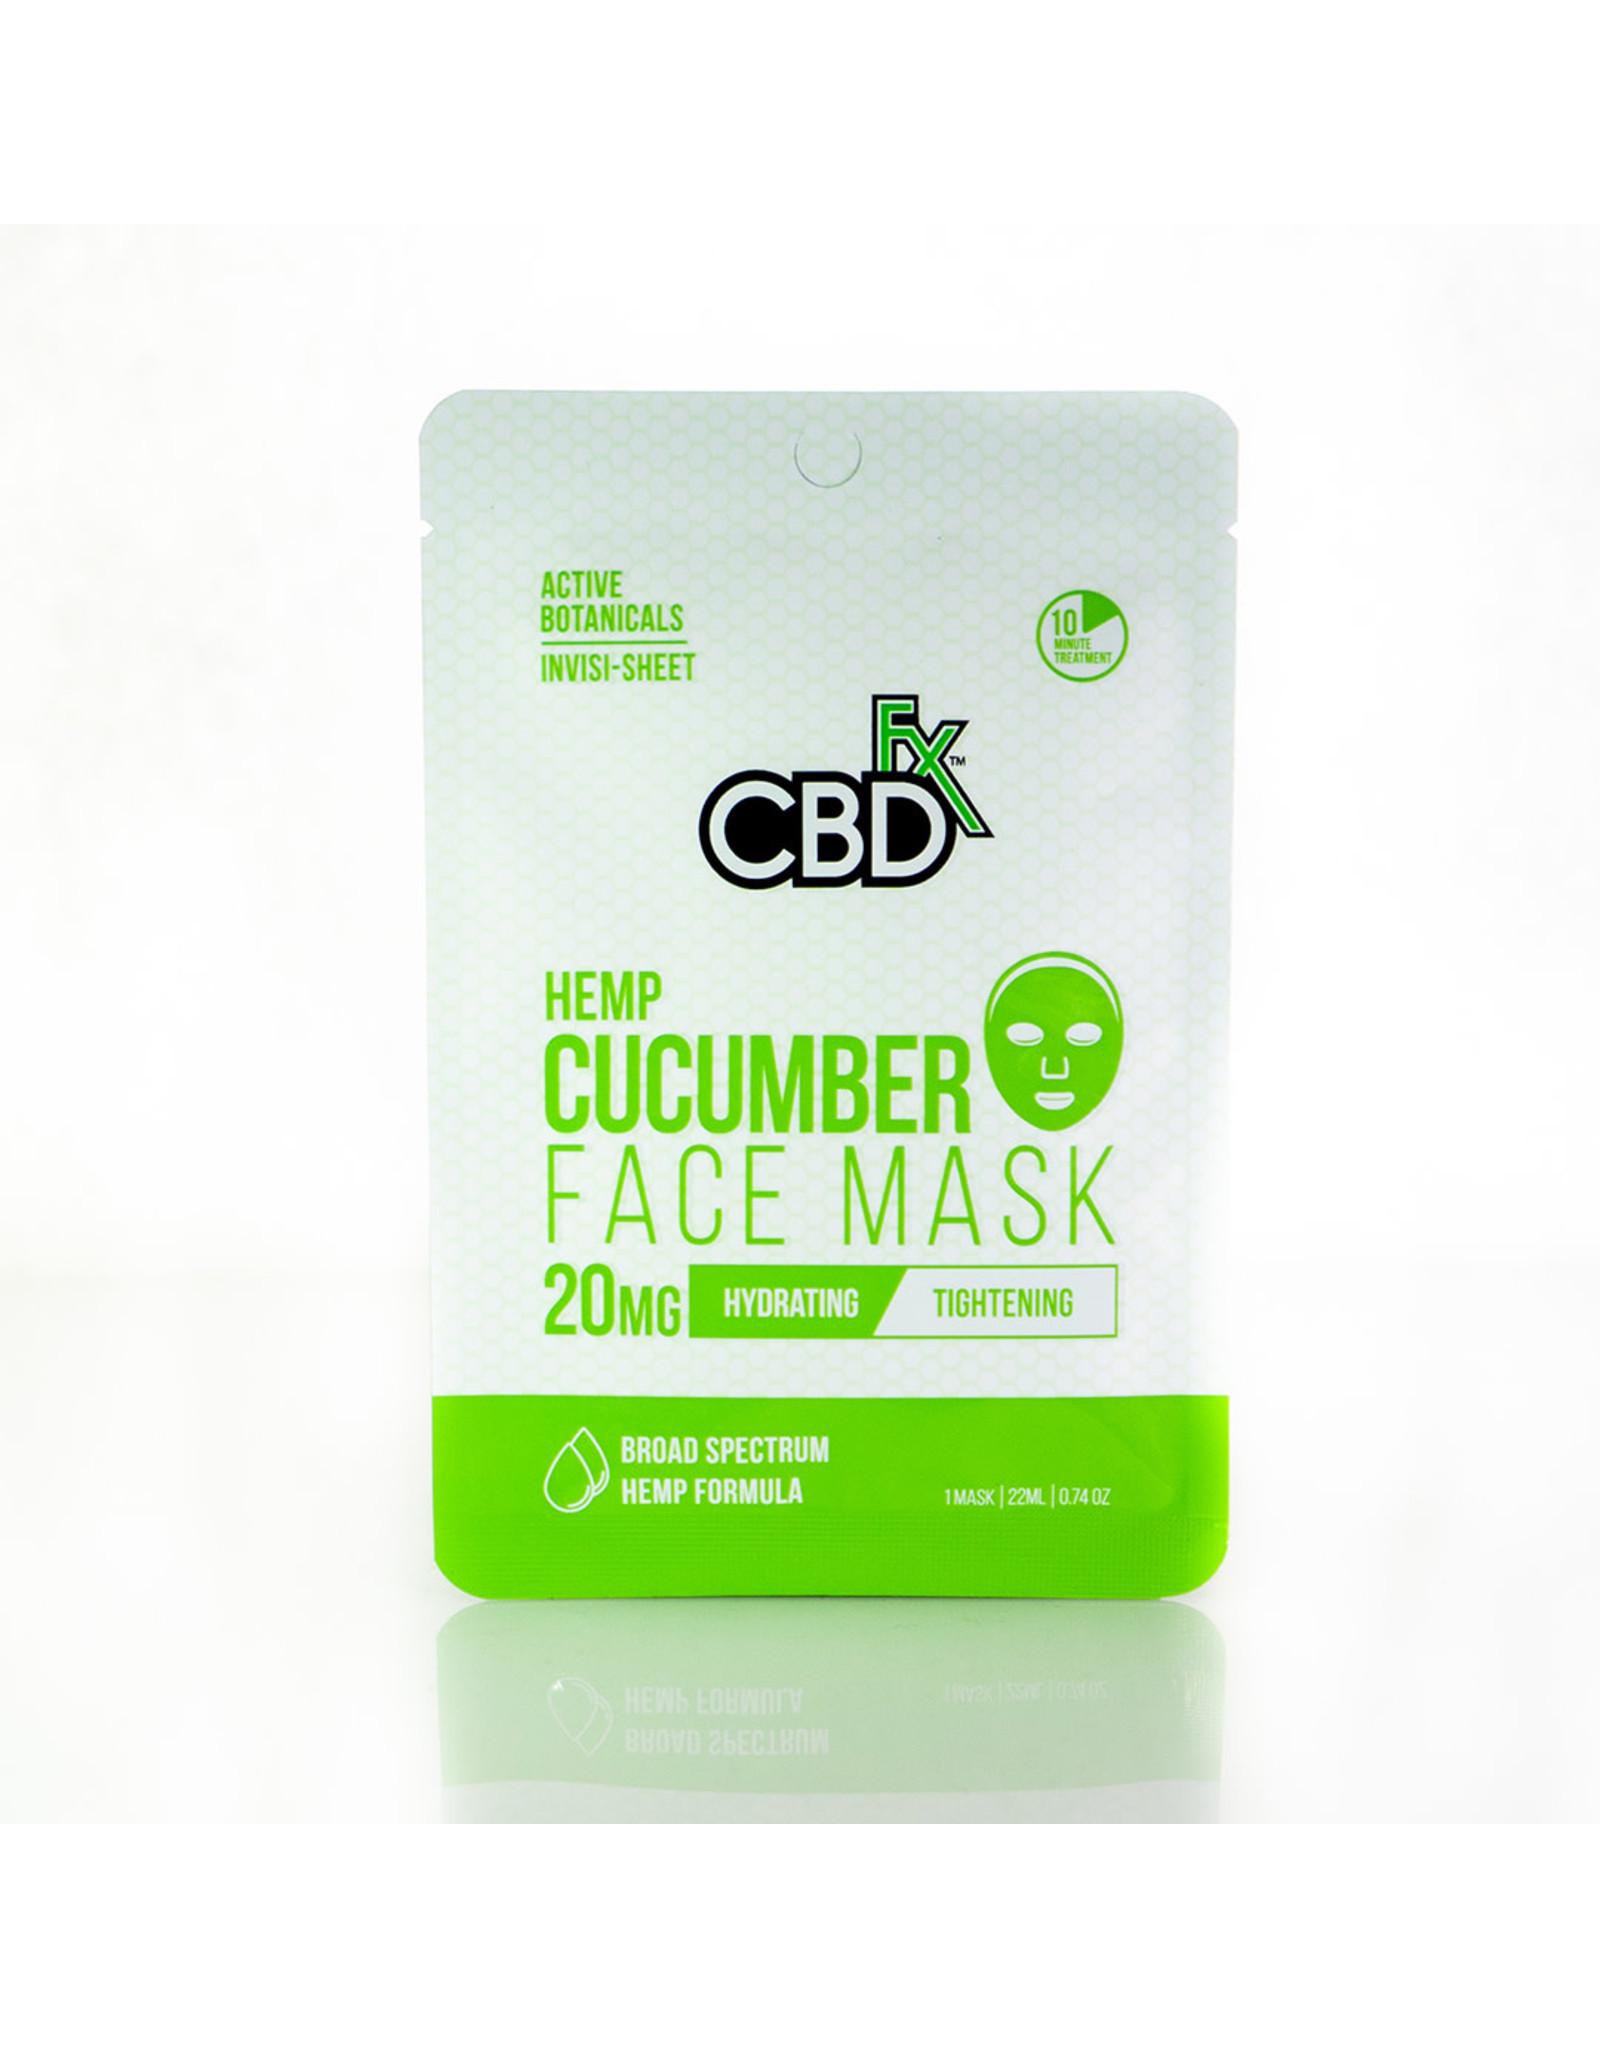 CBD FX: Facemask-